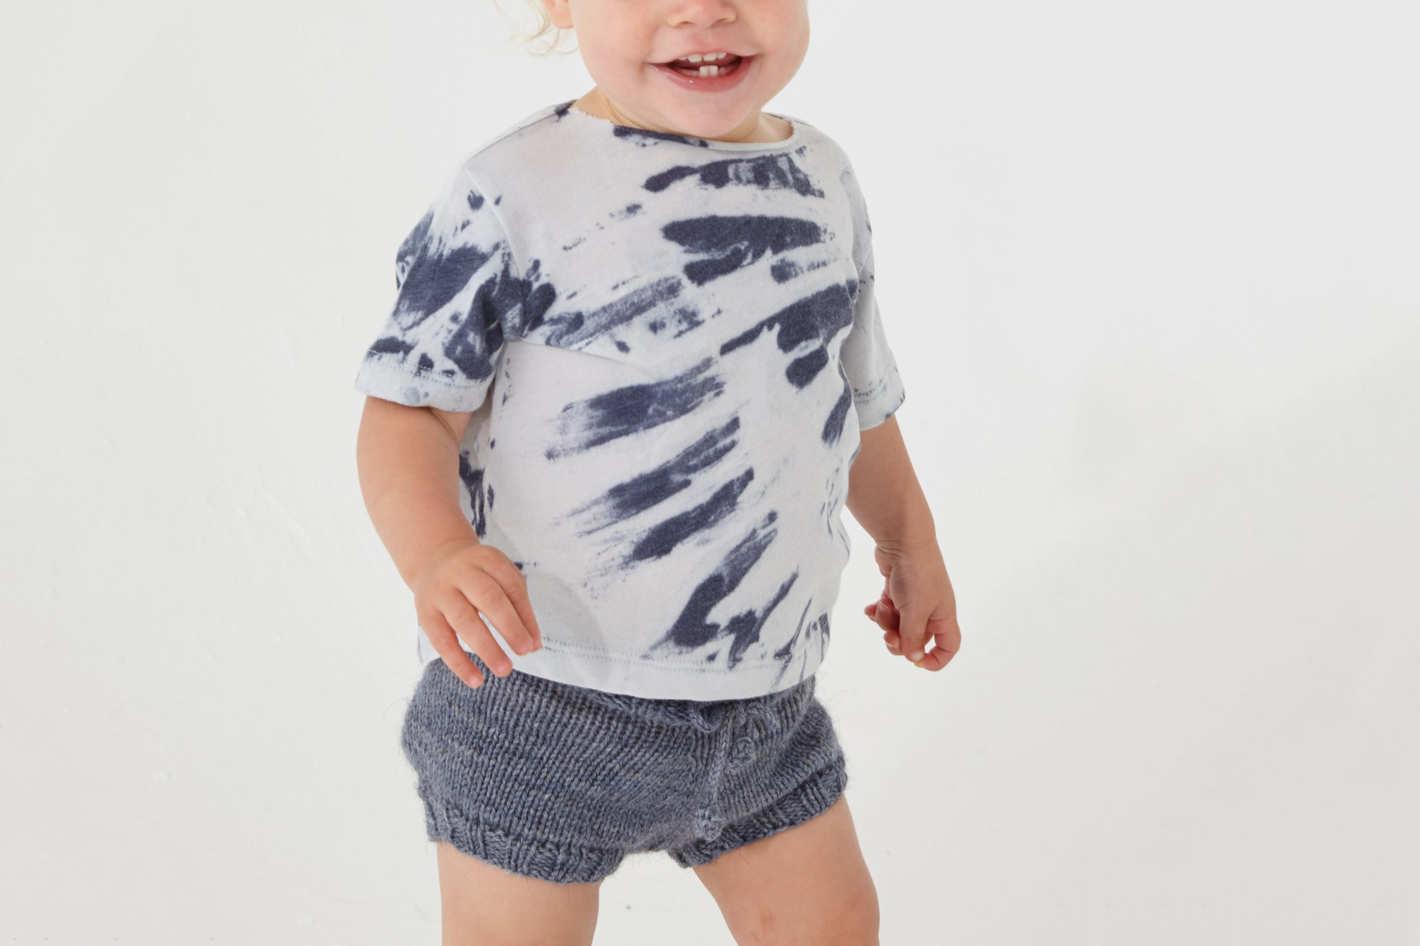 Blue River Tie-Dye Jersey Short-Sleeve Baby Tee